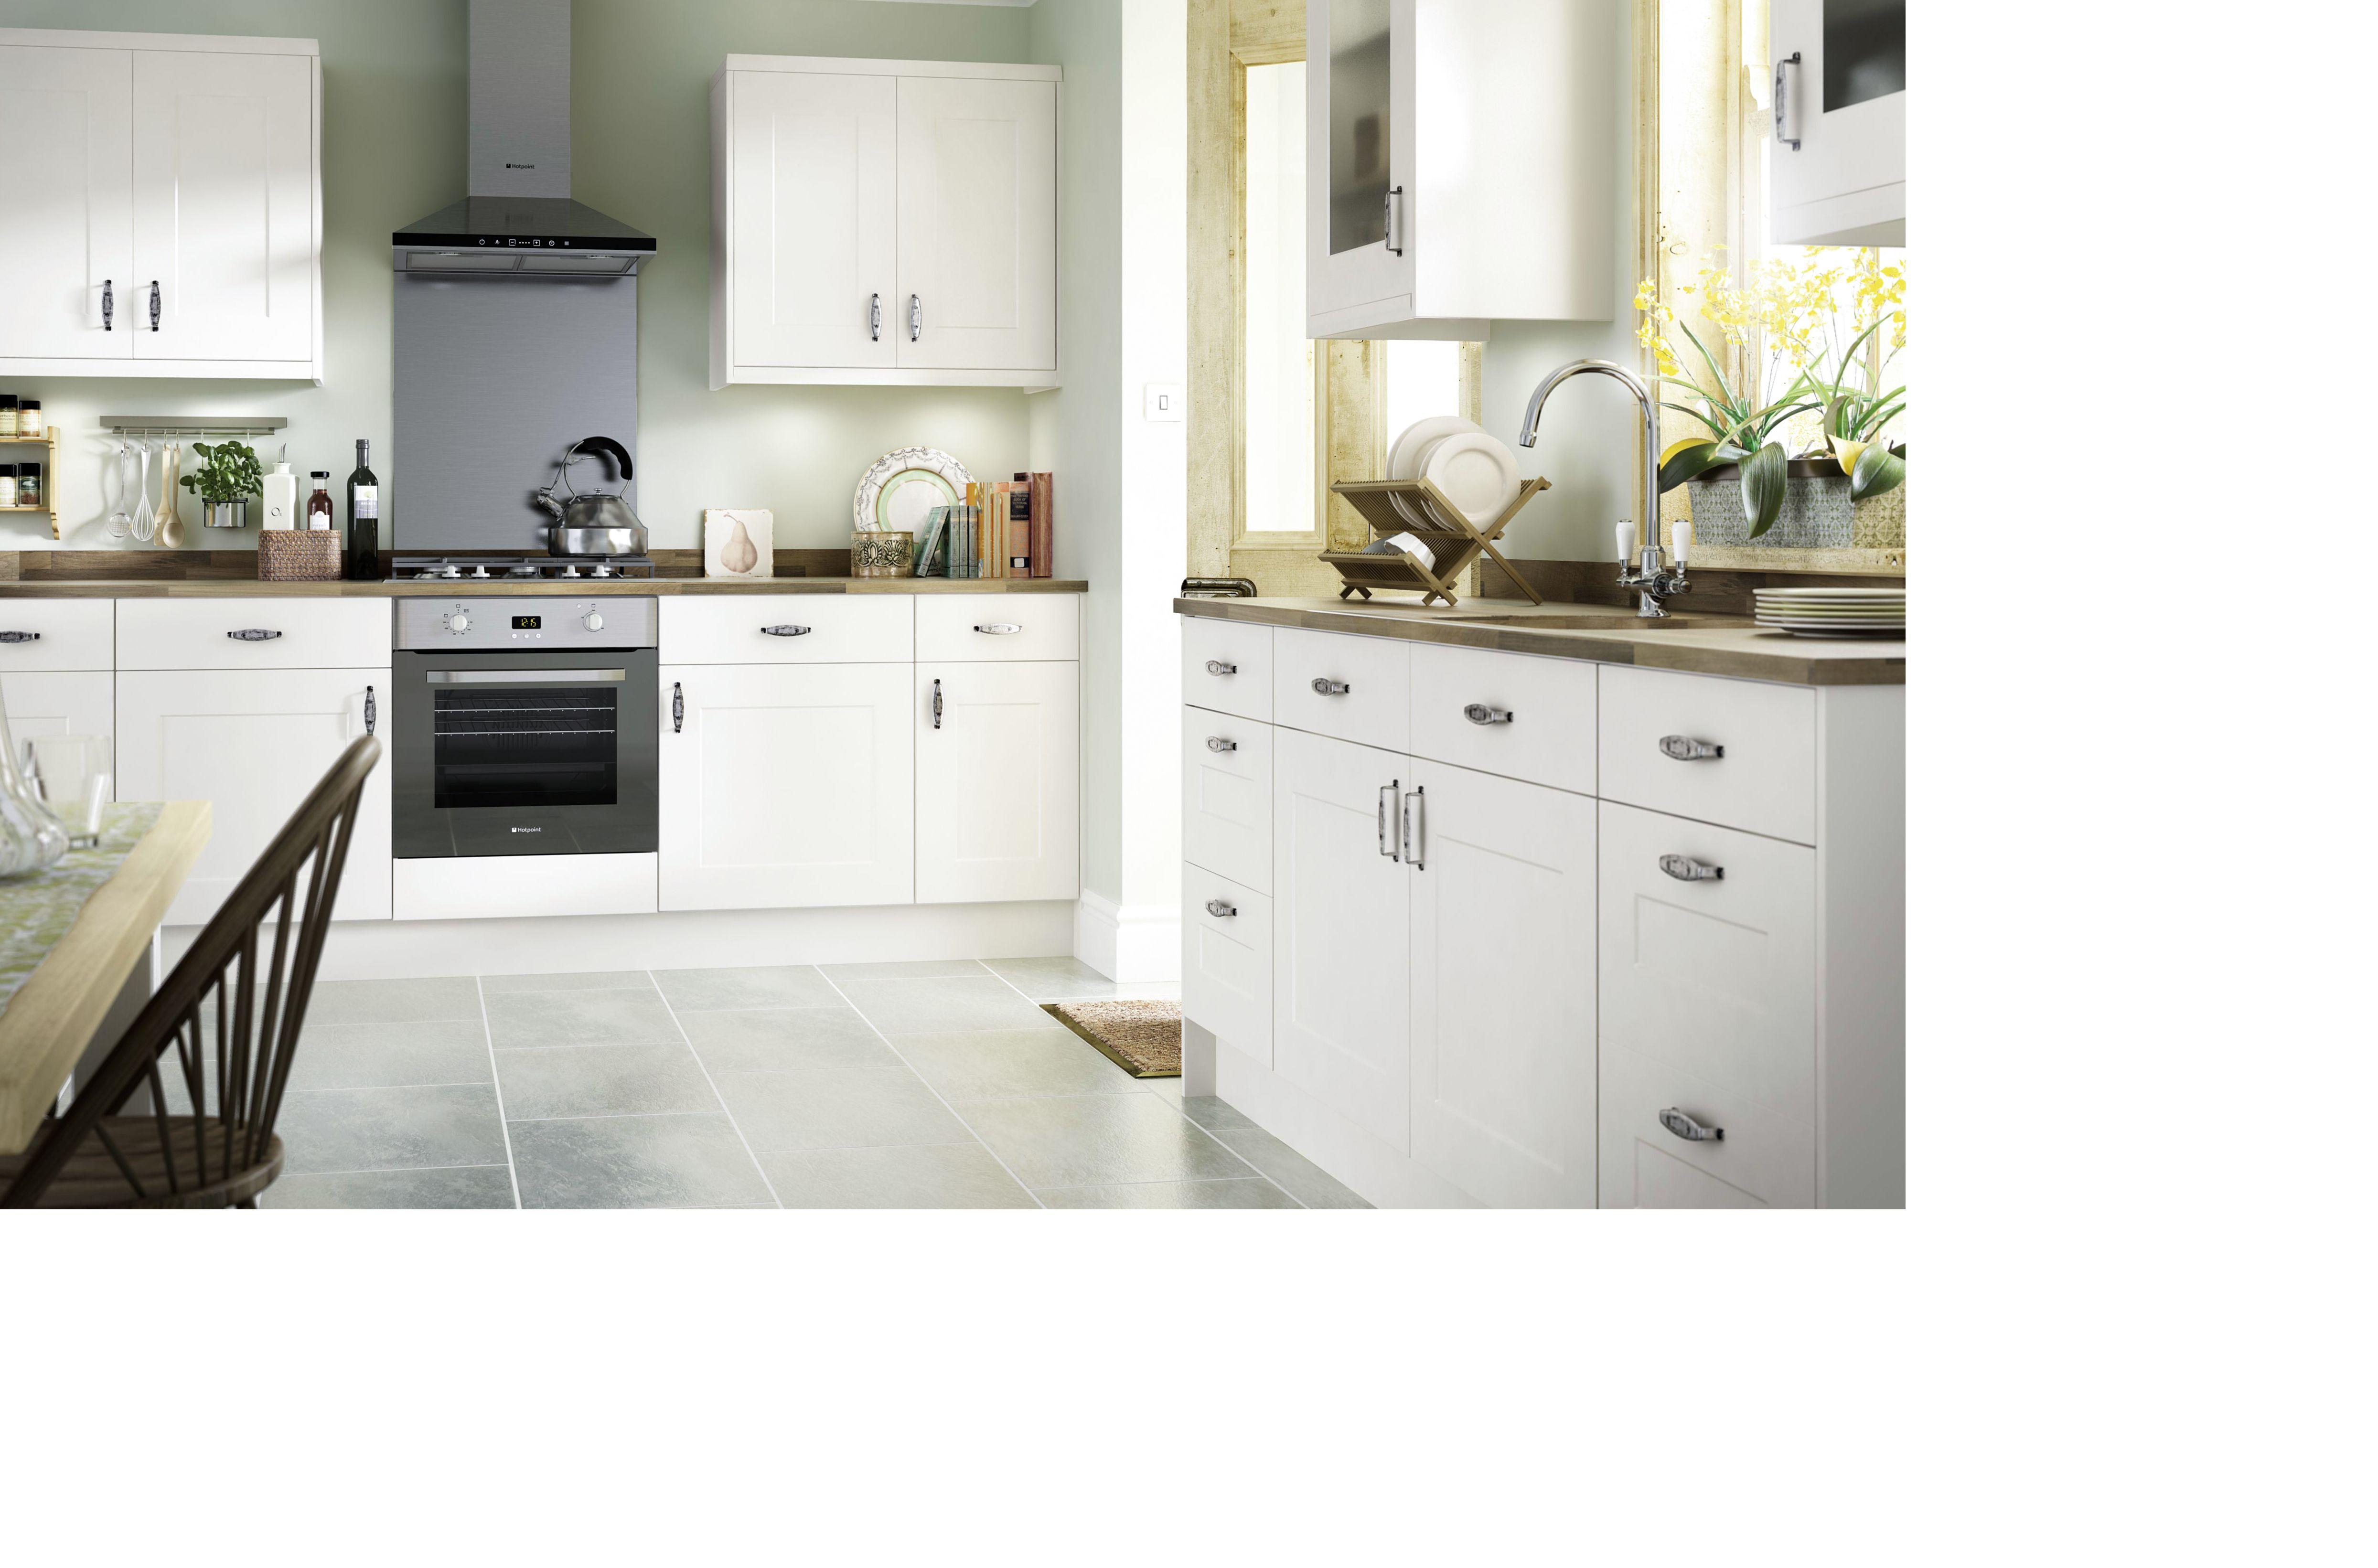 IT Classic Ivory  Kitchen Ranges  Kitchen  Rooms  DIY at B&Q